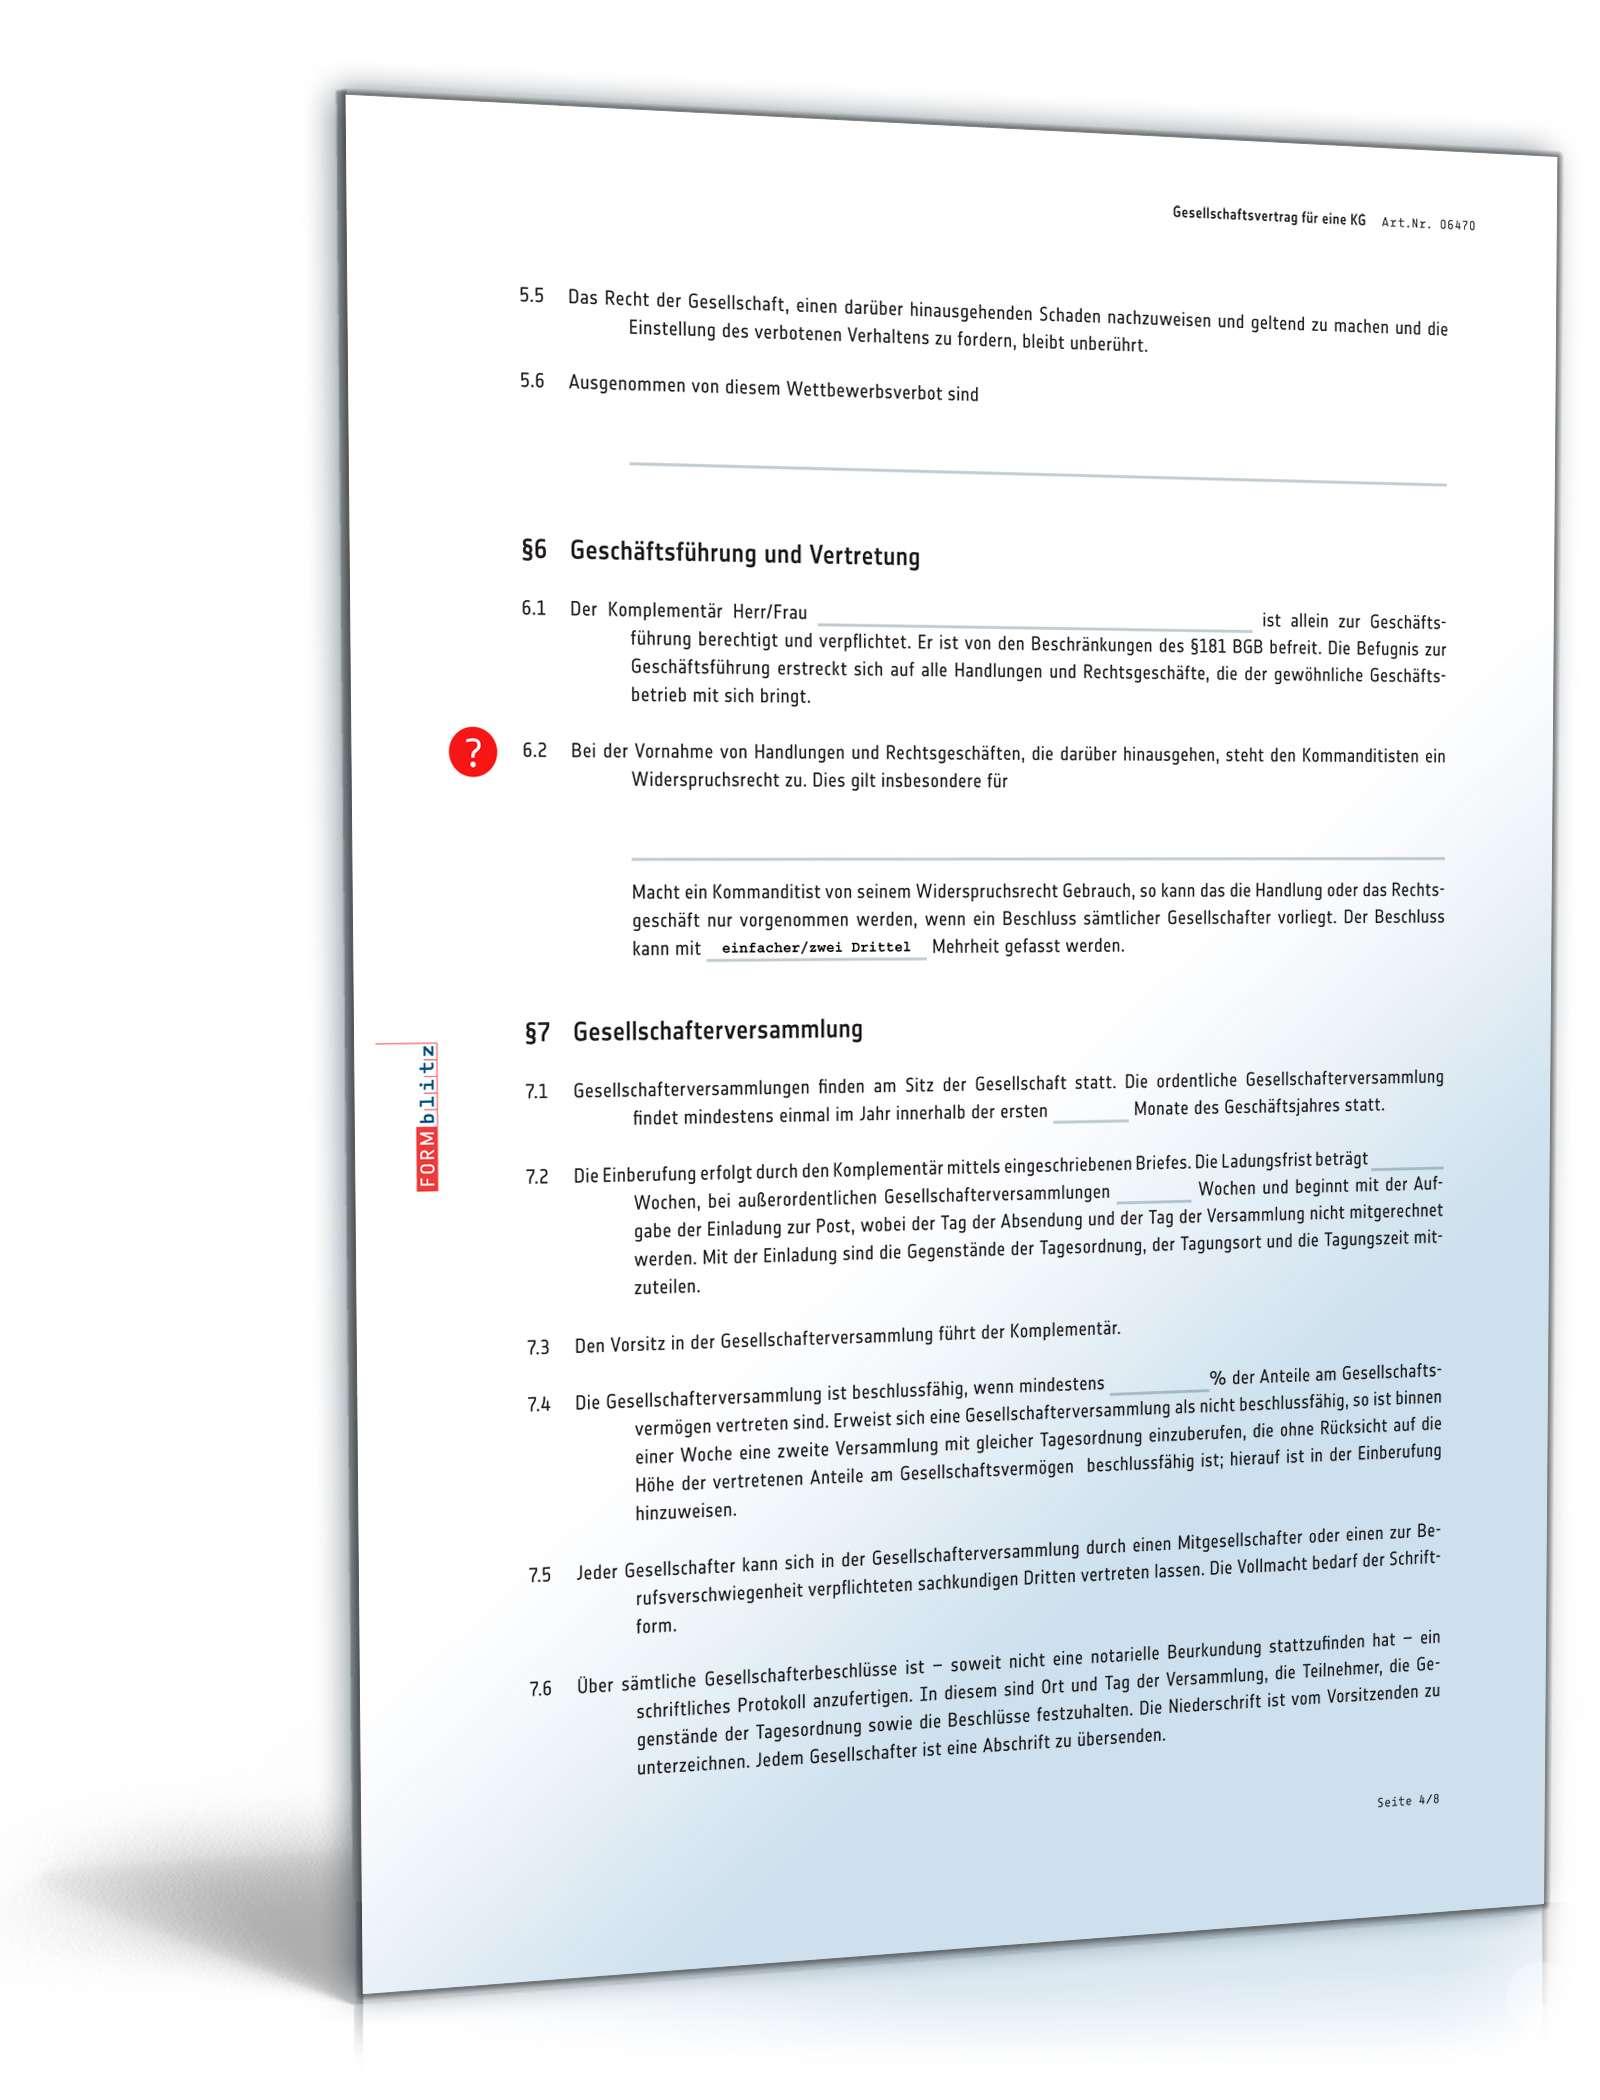 gesellschaftsvertrag kommanditgesellschaft: muster zum download, Einladung